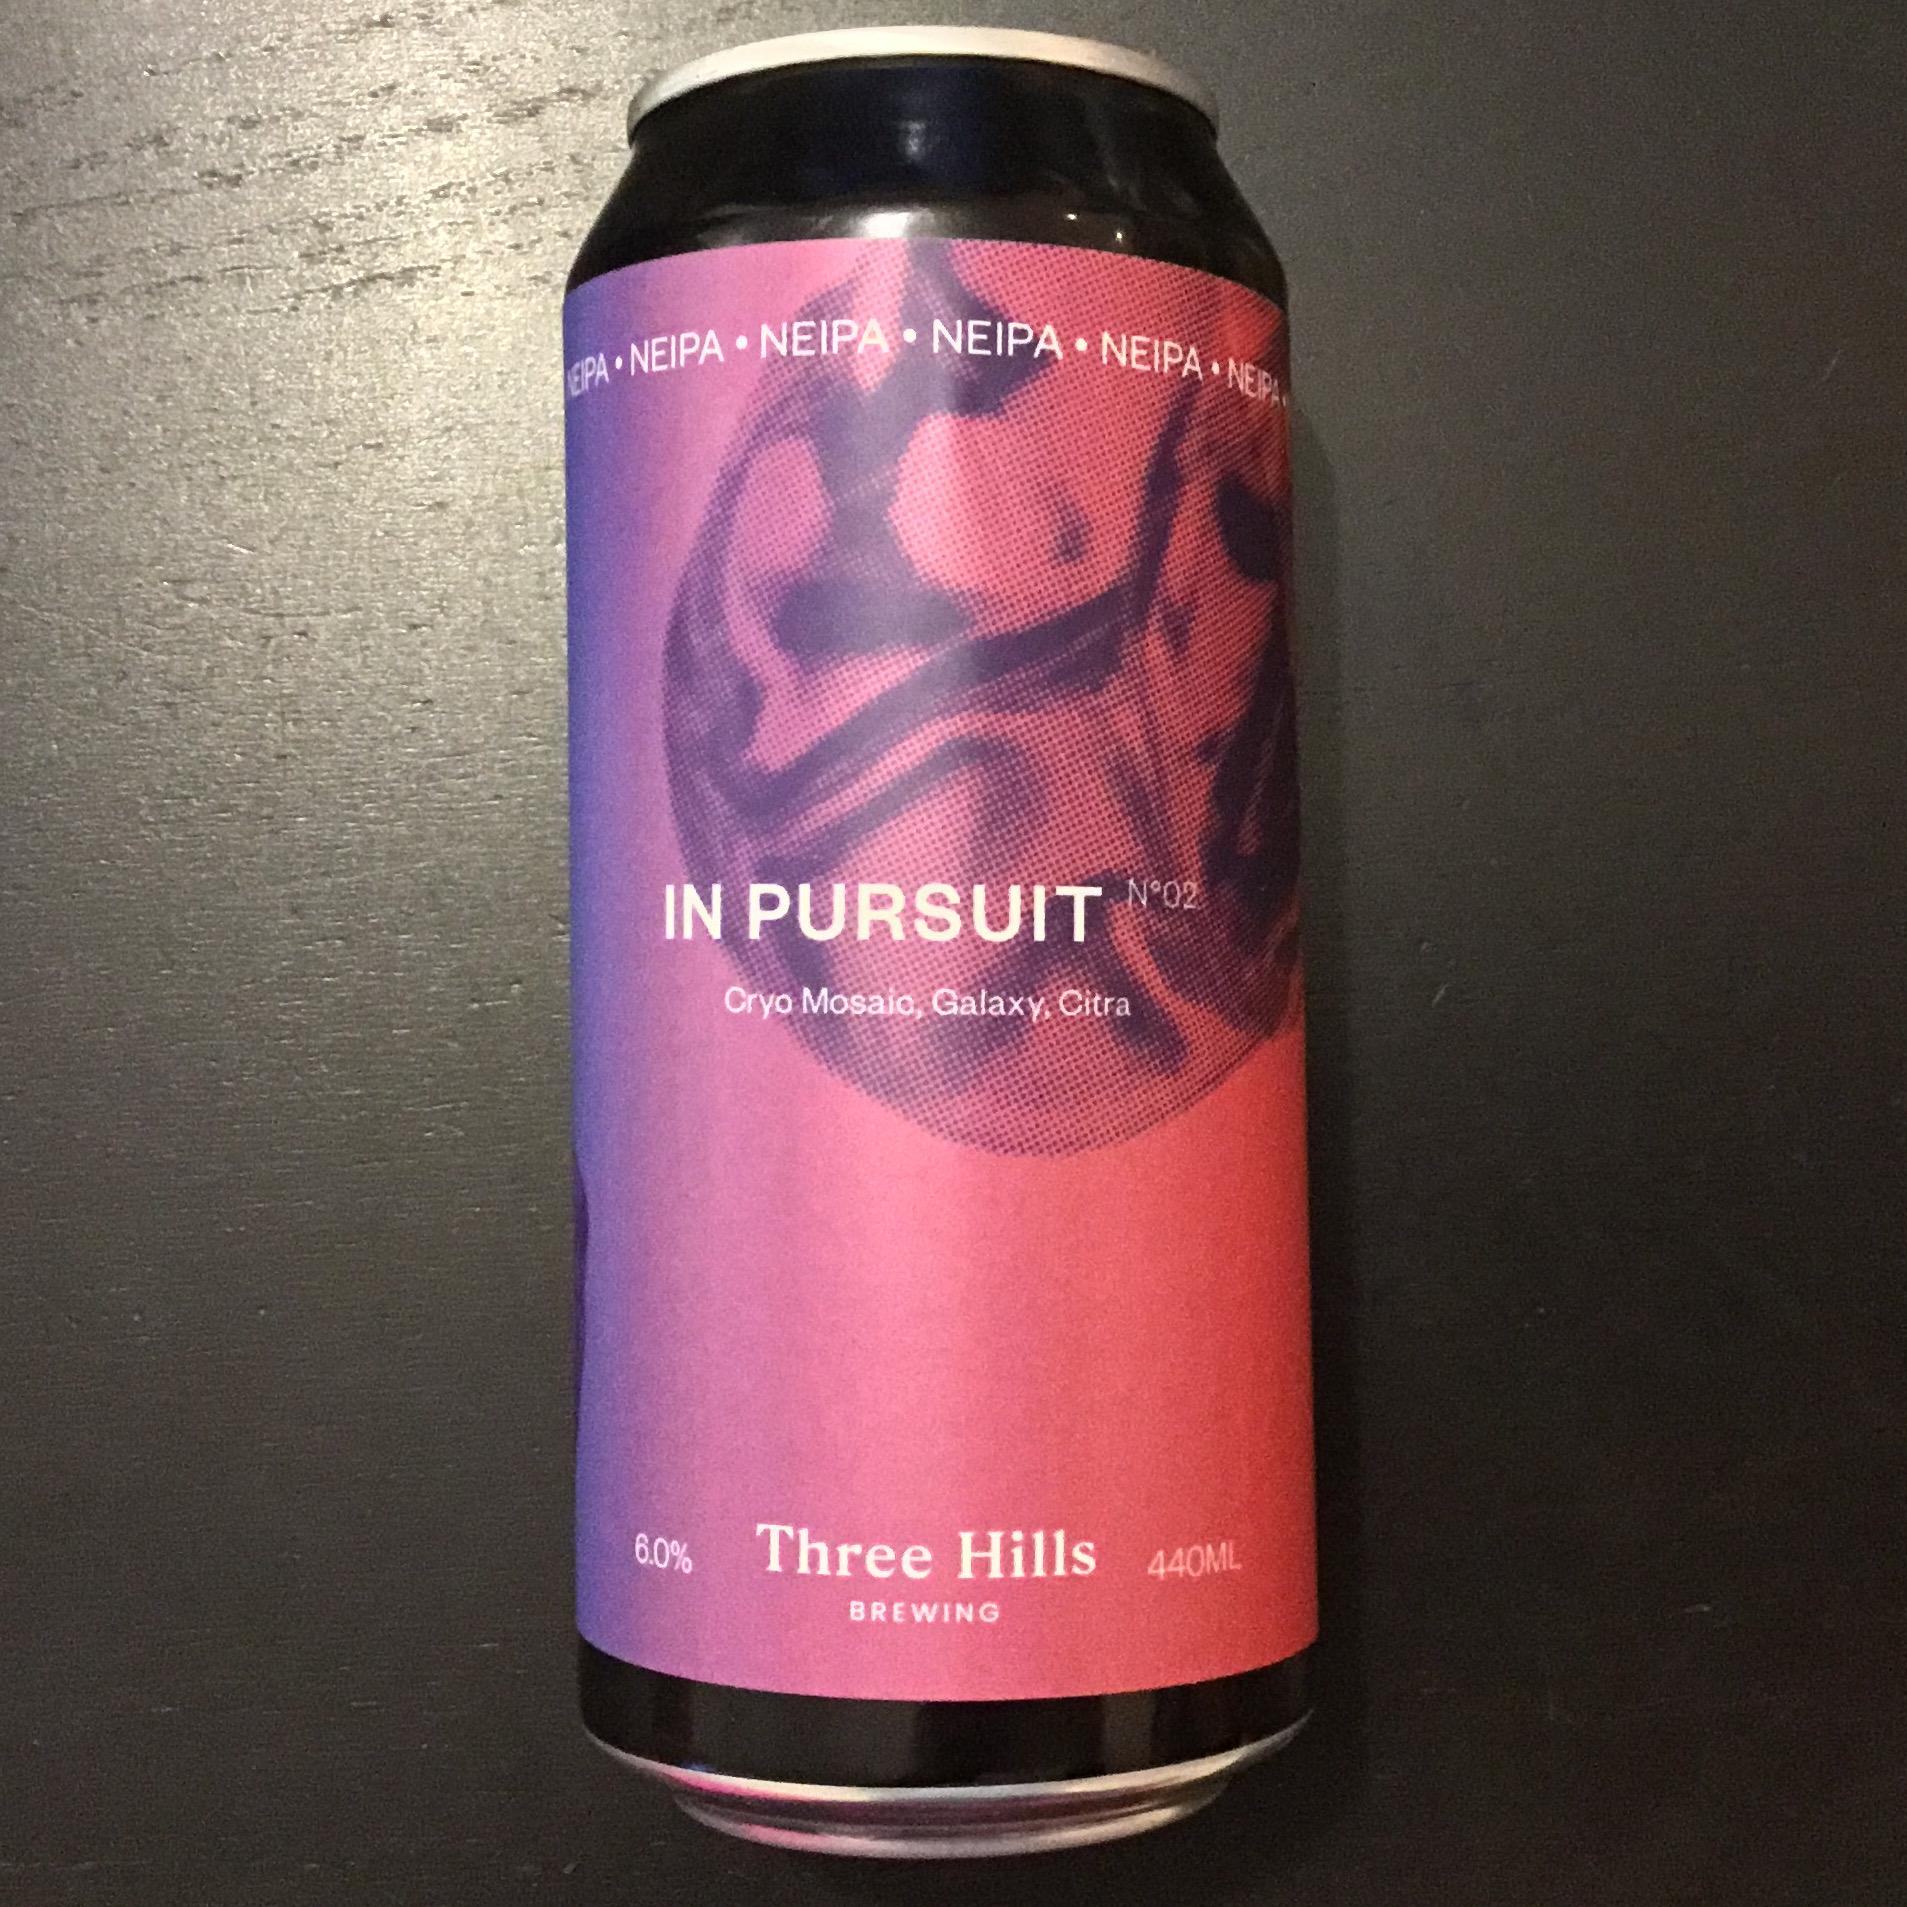 In Pursuit NEIPA 6% 440ml No2 Three Hills Brewing